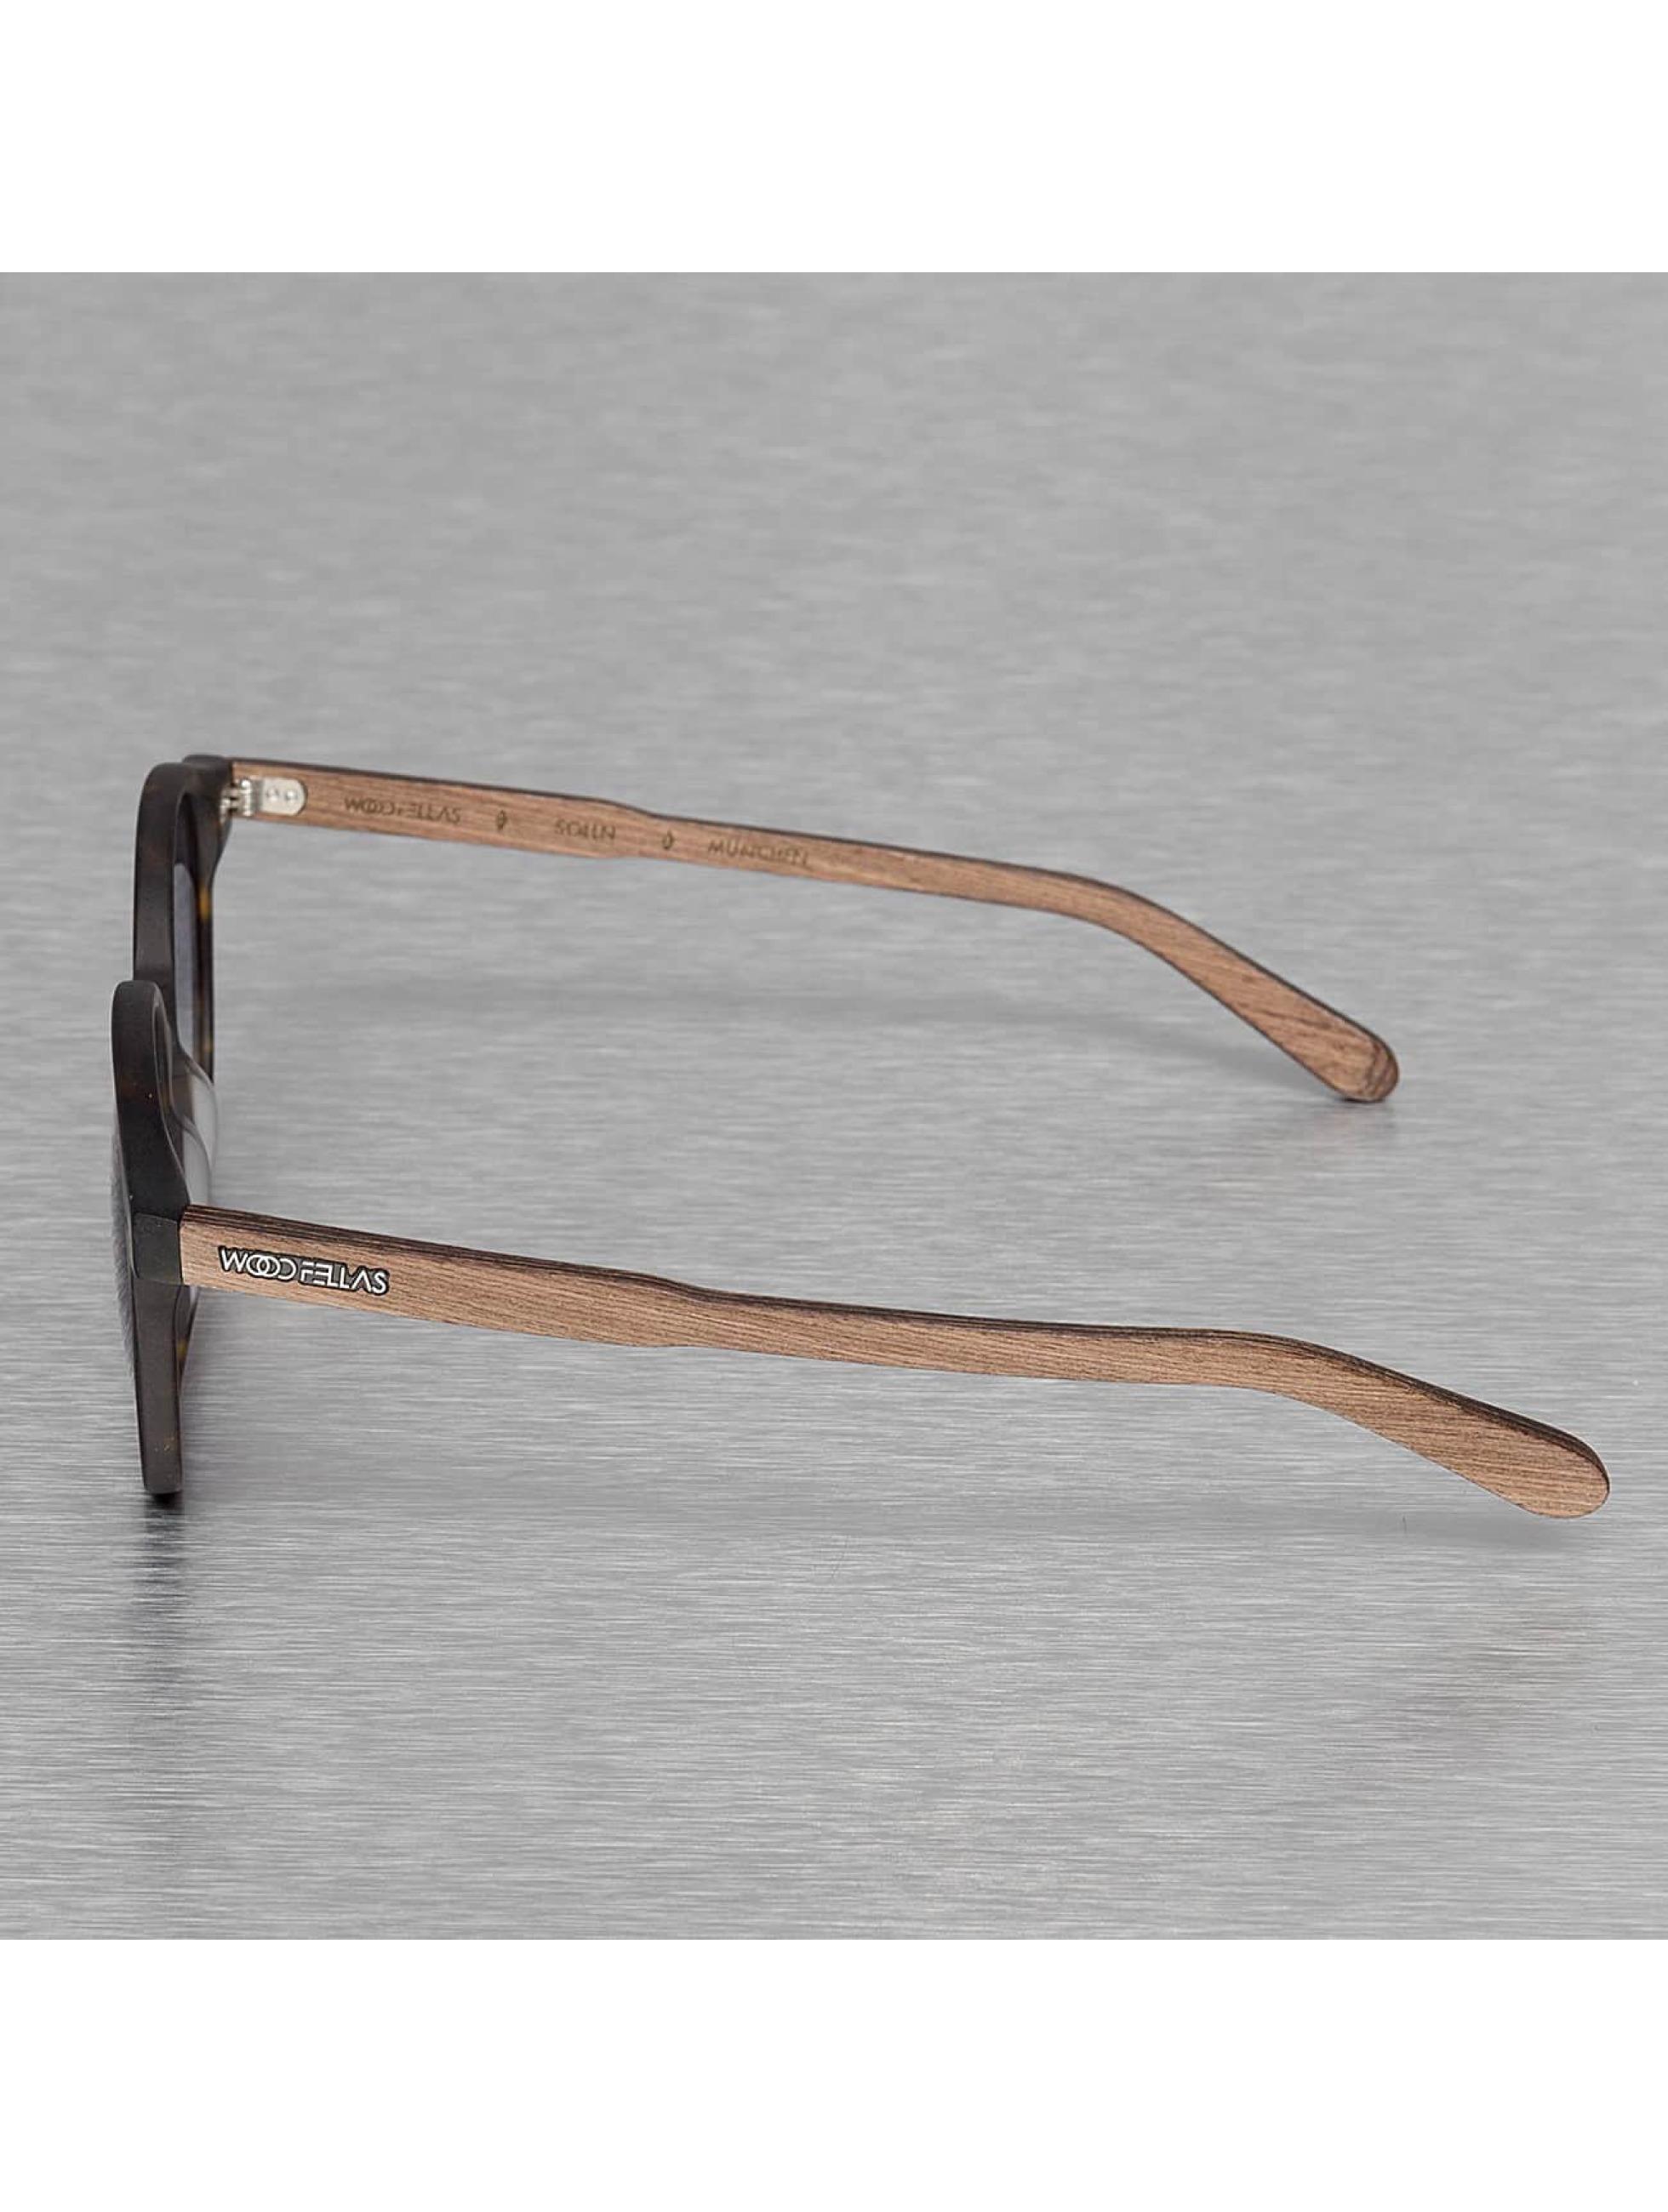 Wood Fellas Eyewear Sunglasses Eyewear Solln Polarized Mirror brown